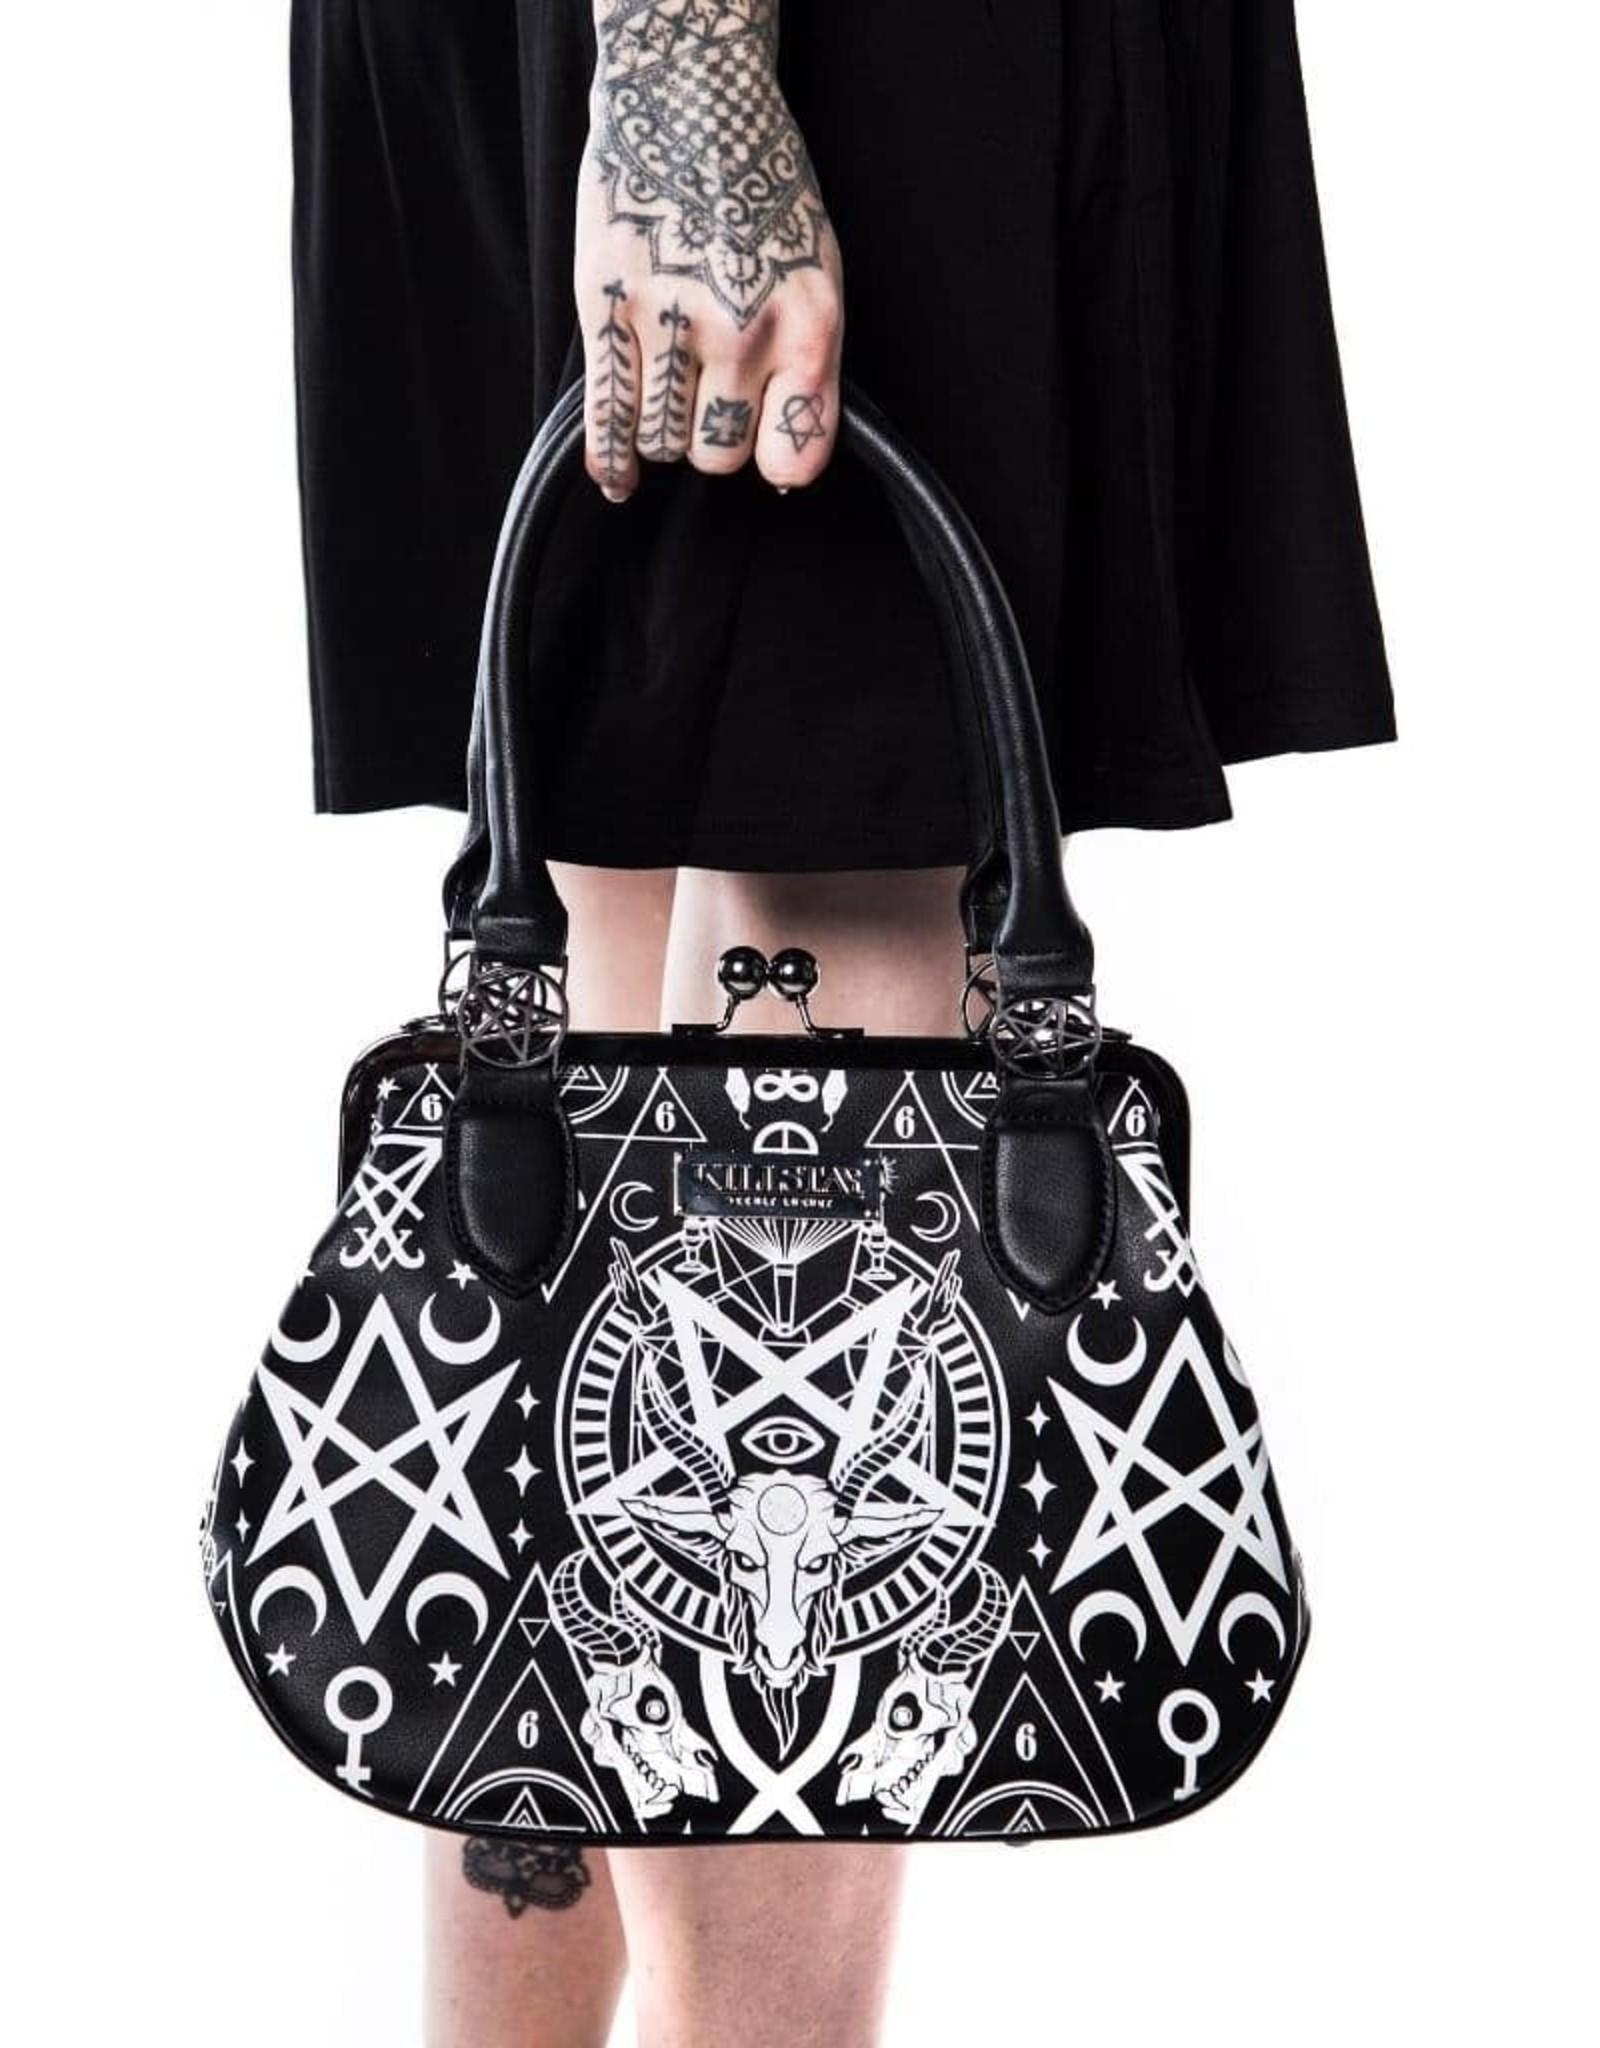 Killstar Gothic bags Steampunk bags - Killstar Holly Wouldn't handbag Baphomet